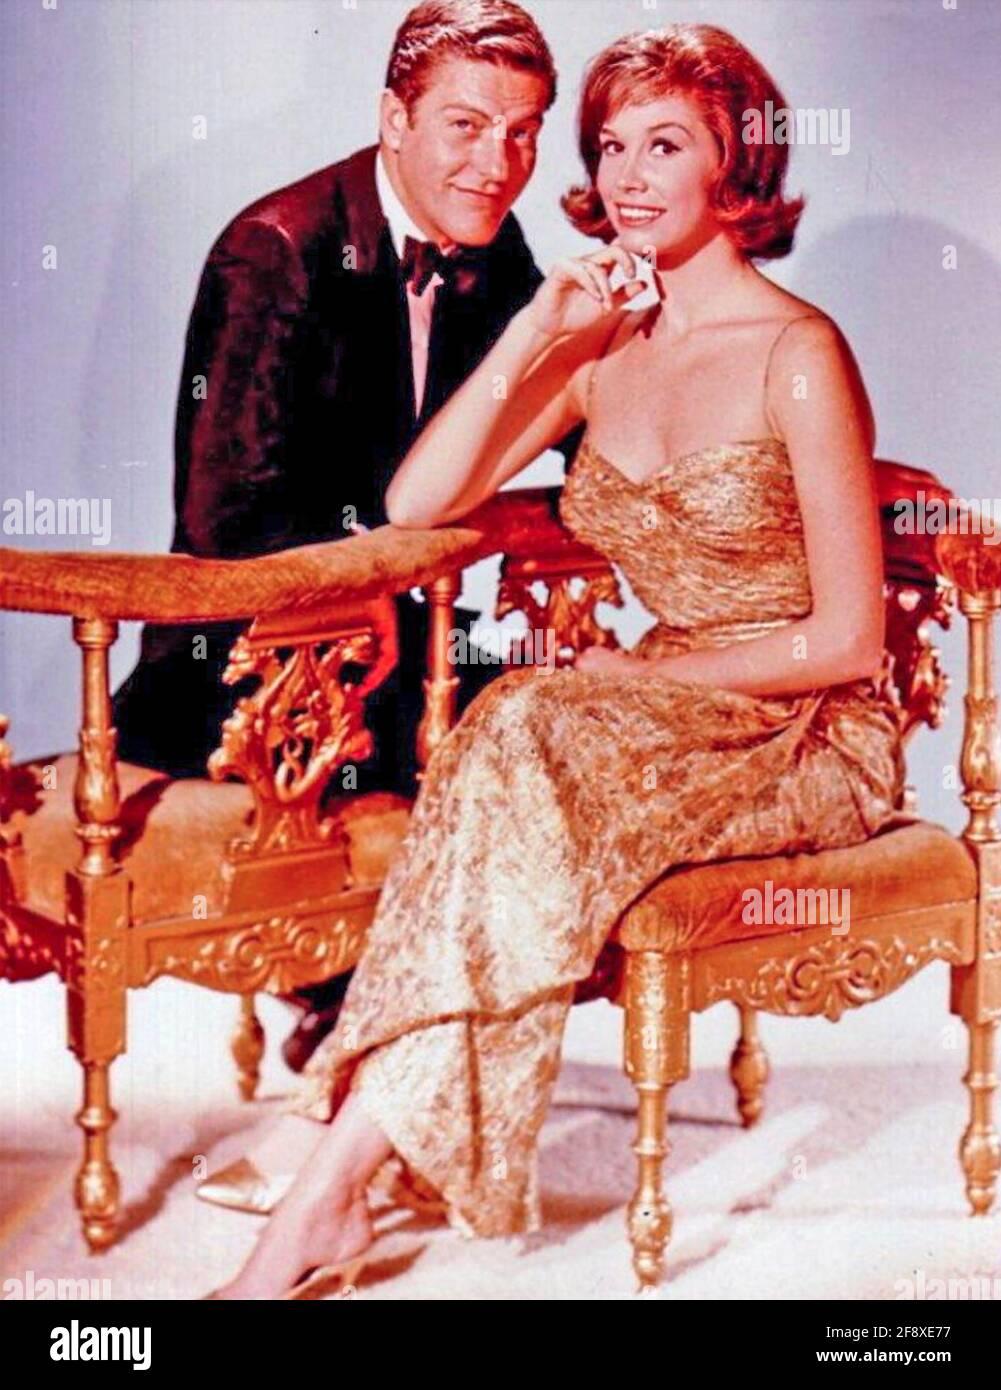 IL DICK VAN DYKE MOSTRA CBS SERIE TV 1961-1966 CON Mary Tyler Moore e Dick Van Dyke Foto Stock